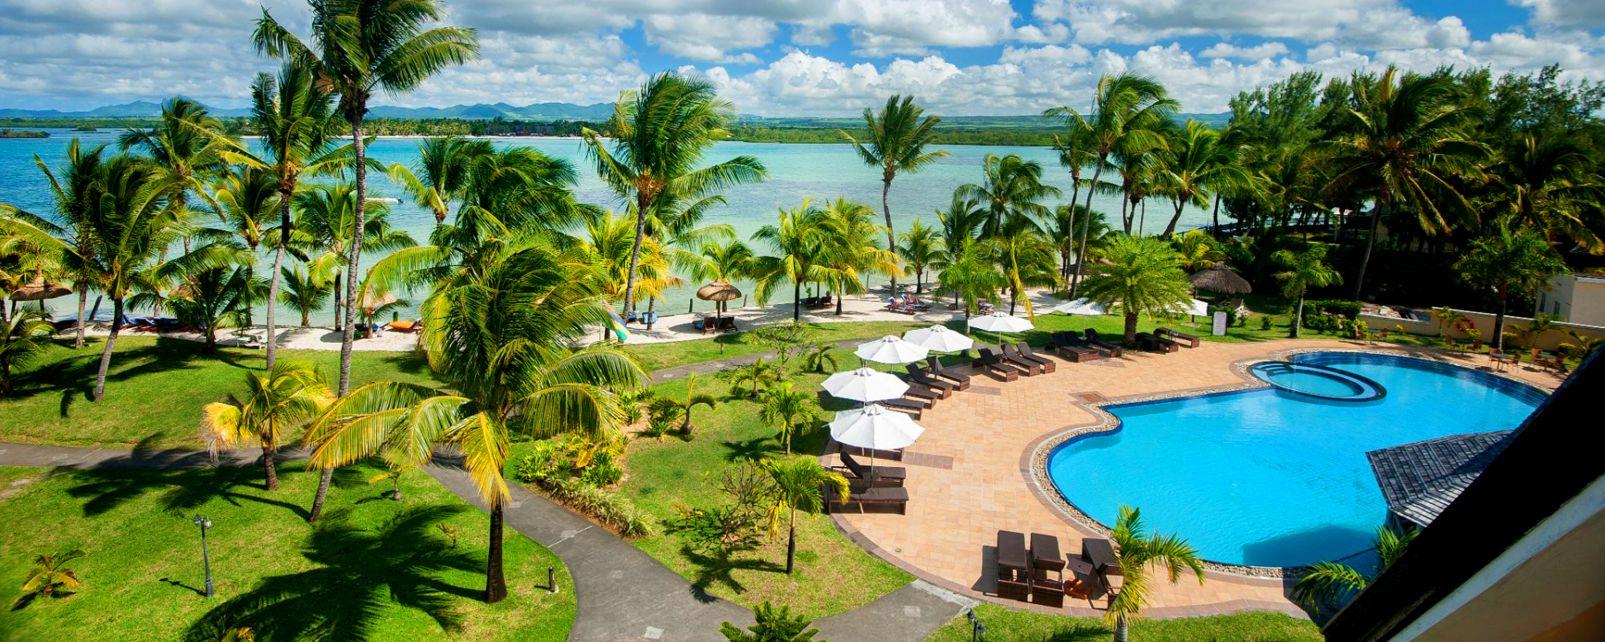 Club Coralia Jalsa Beach Hotel and Spa